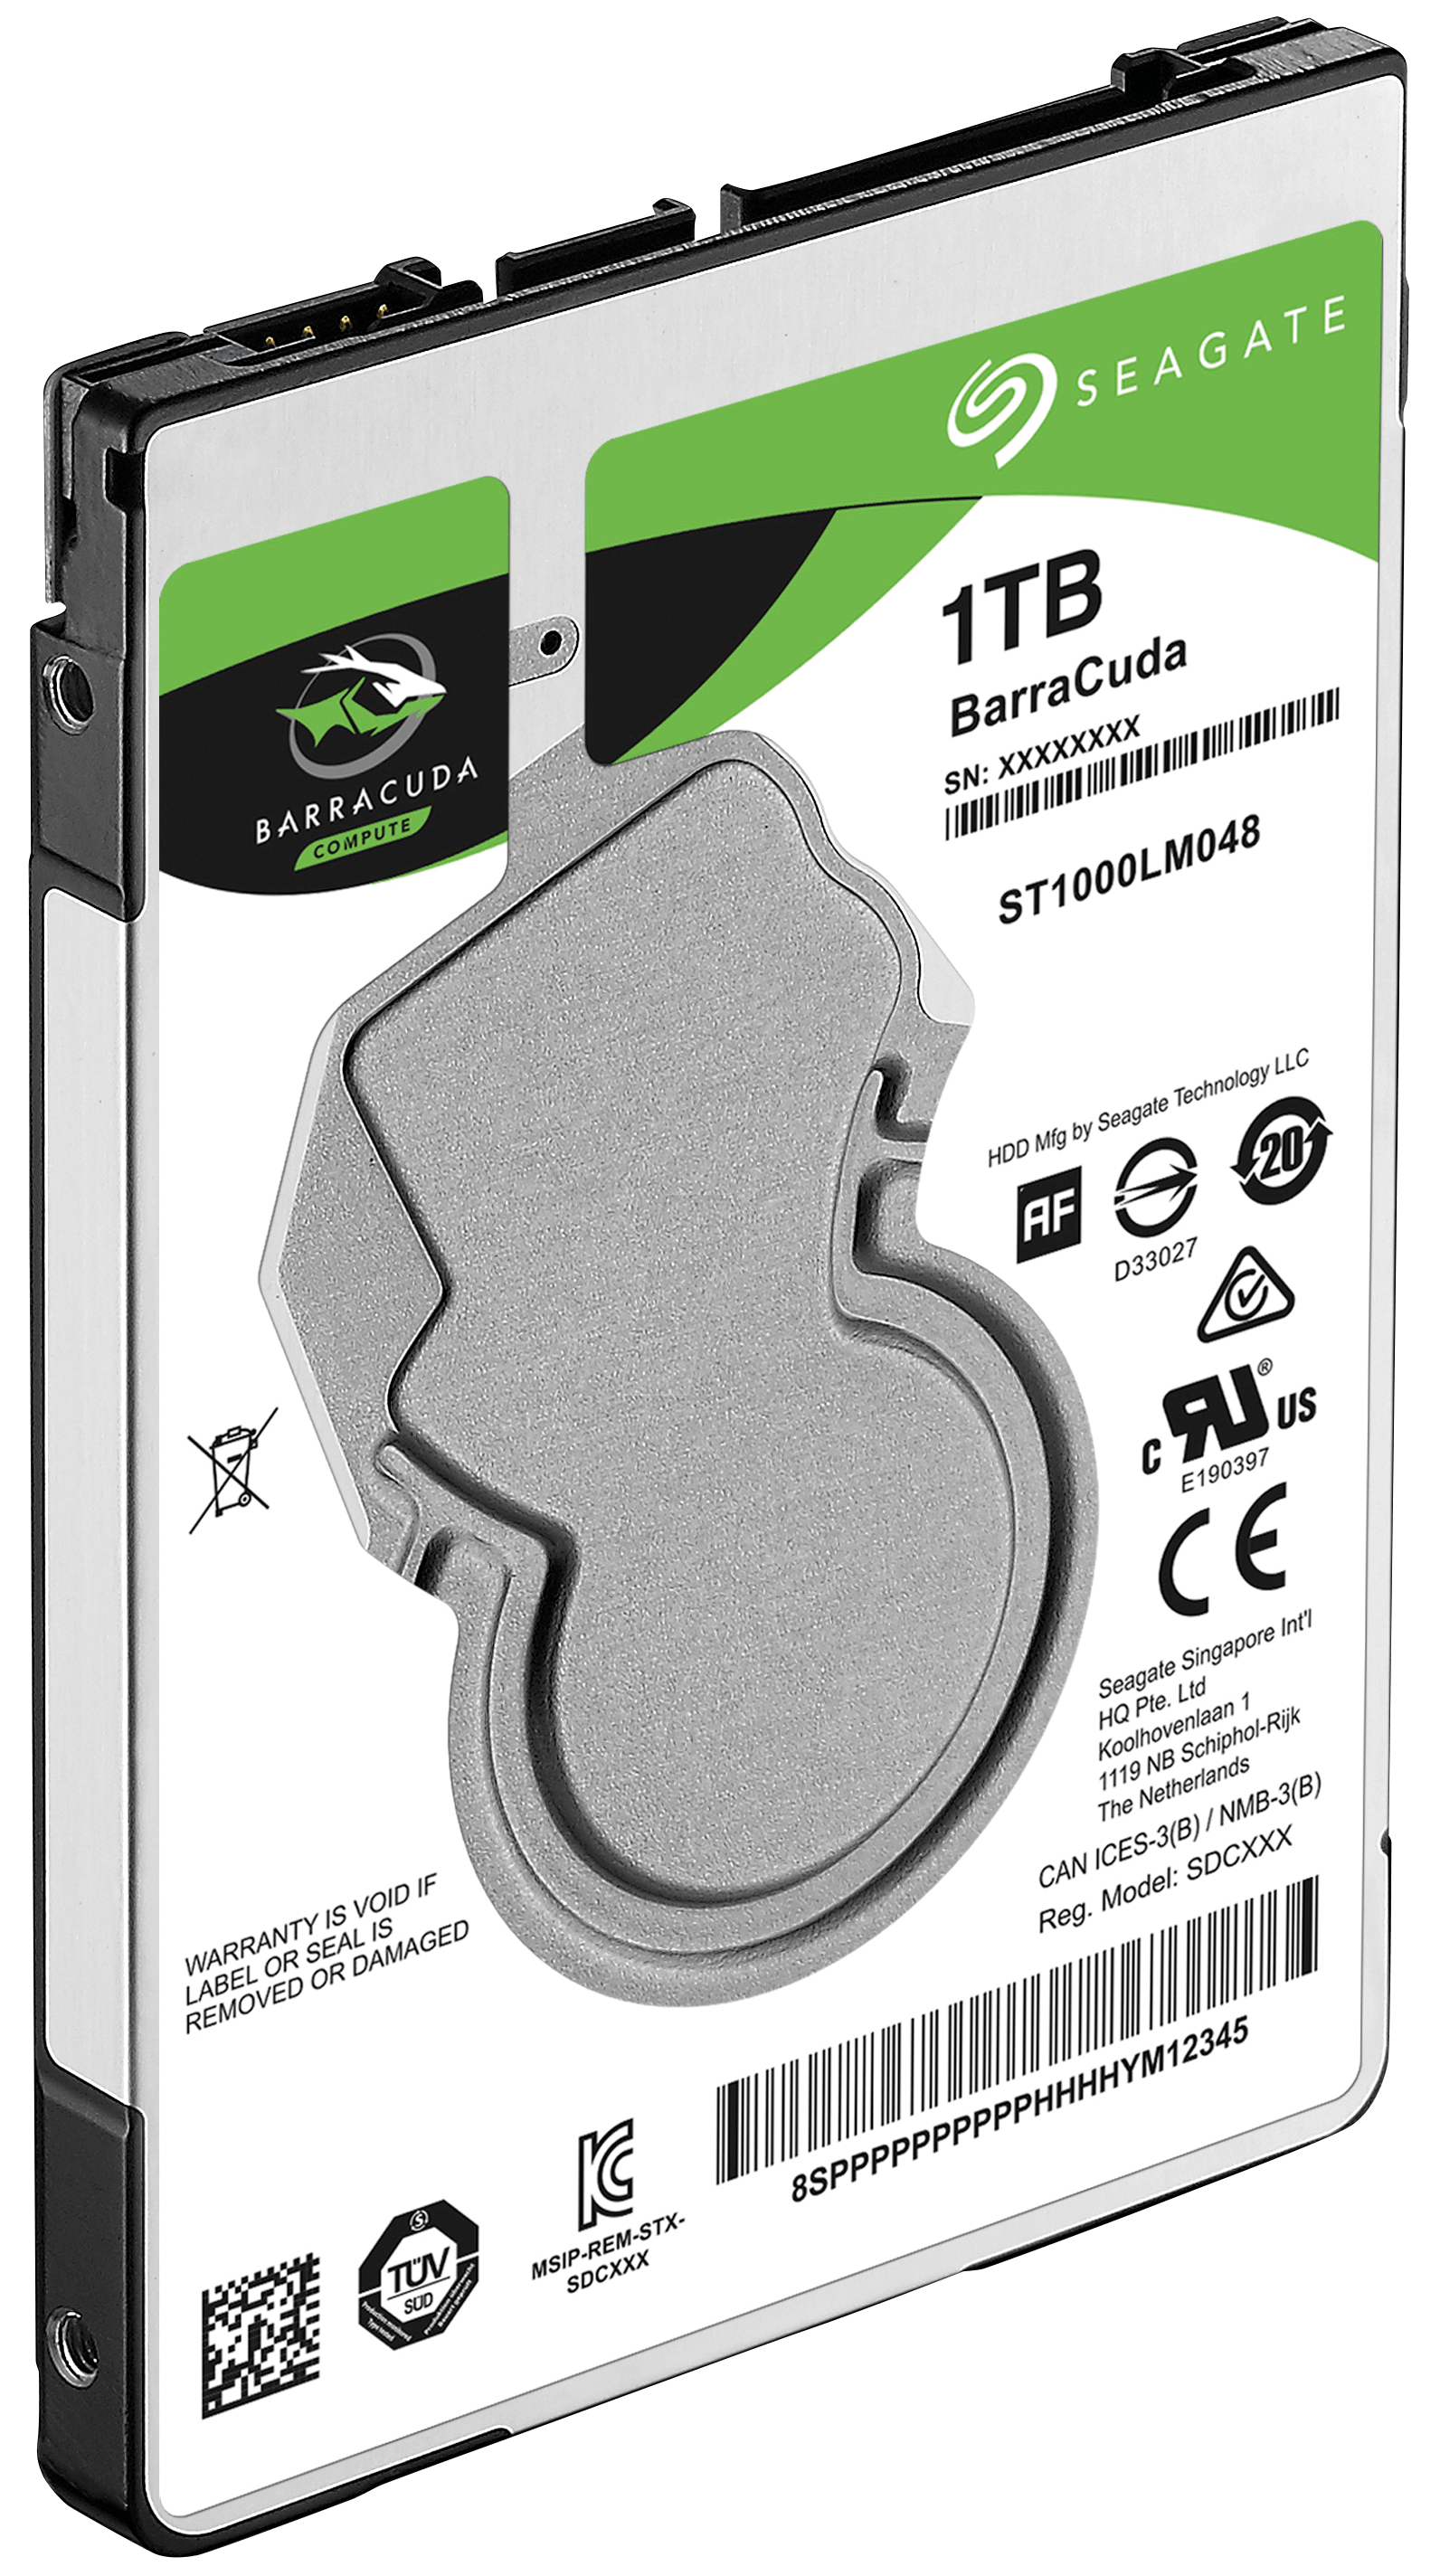 Seagate 1TB Internal BarraCuda SATA 2.5 HDD